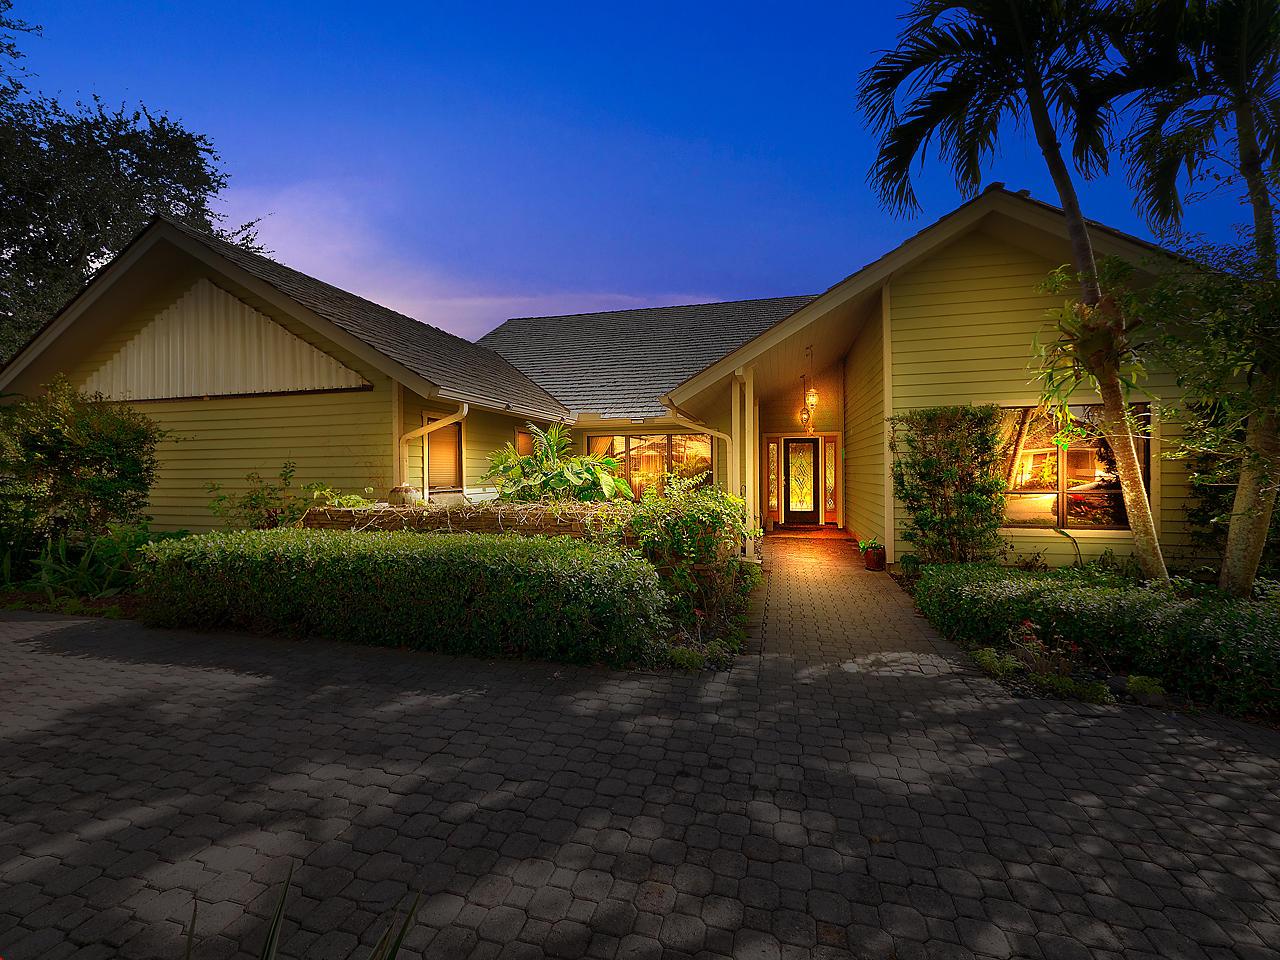 5824 Glen Eagle Way, Stuart, Florida 34997, 3 Bedrooms Bedrooms, ,2.1 BathroomsBathrooms,A,Single family,Glen Eagle,RX-10602665